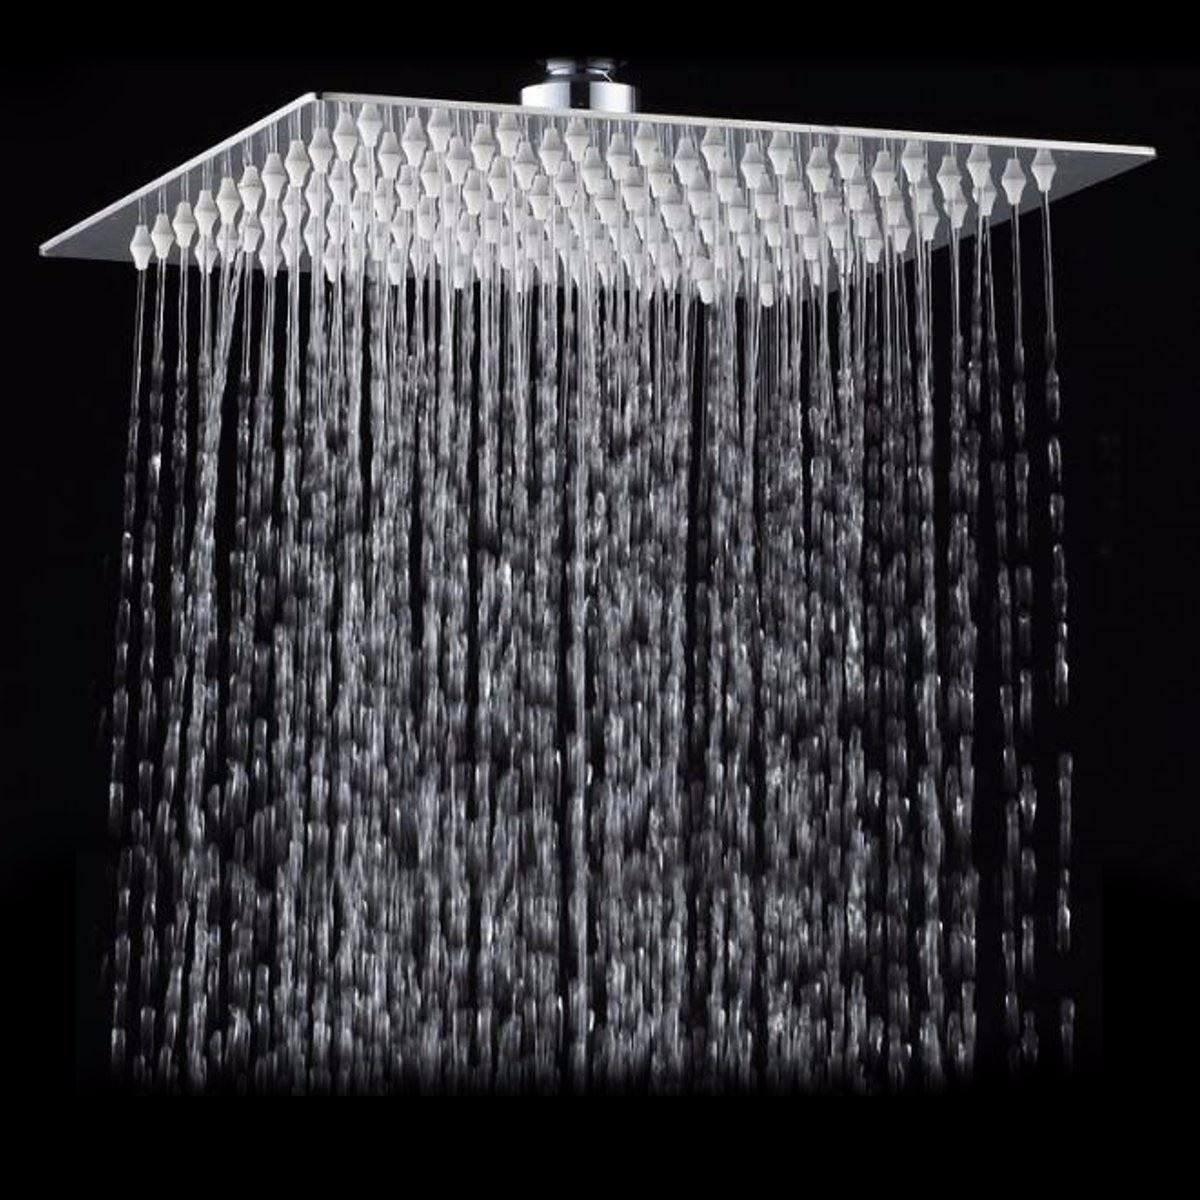 Platz Badezimmer Edelstahl Regen Duschkopf Niederschläge 12 Zoll Bad Dusche Chrom Top Sprayer Regendusche